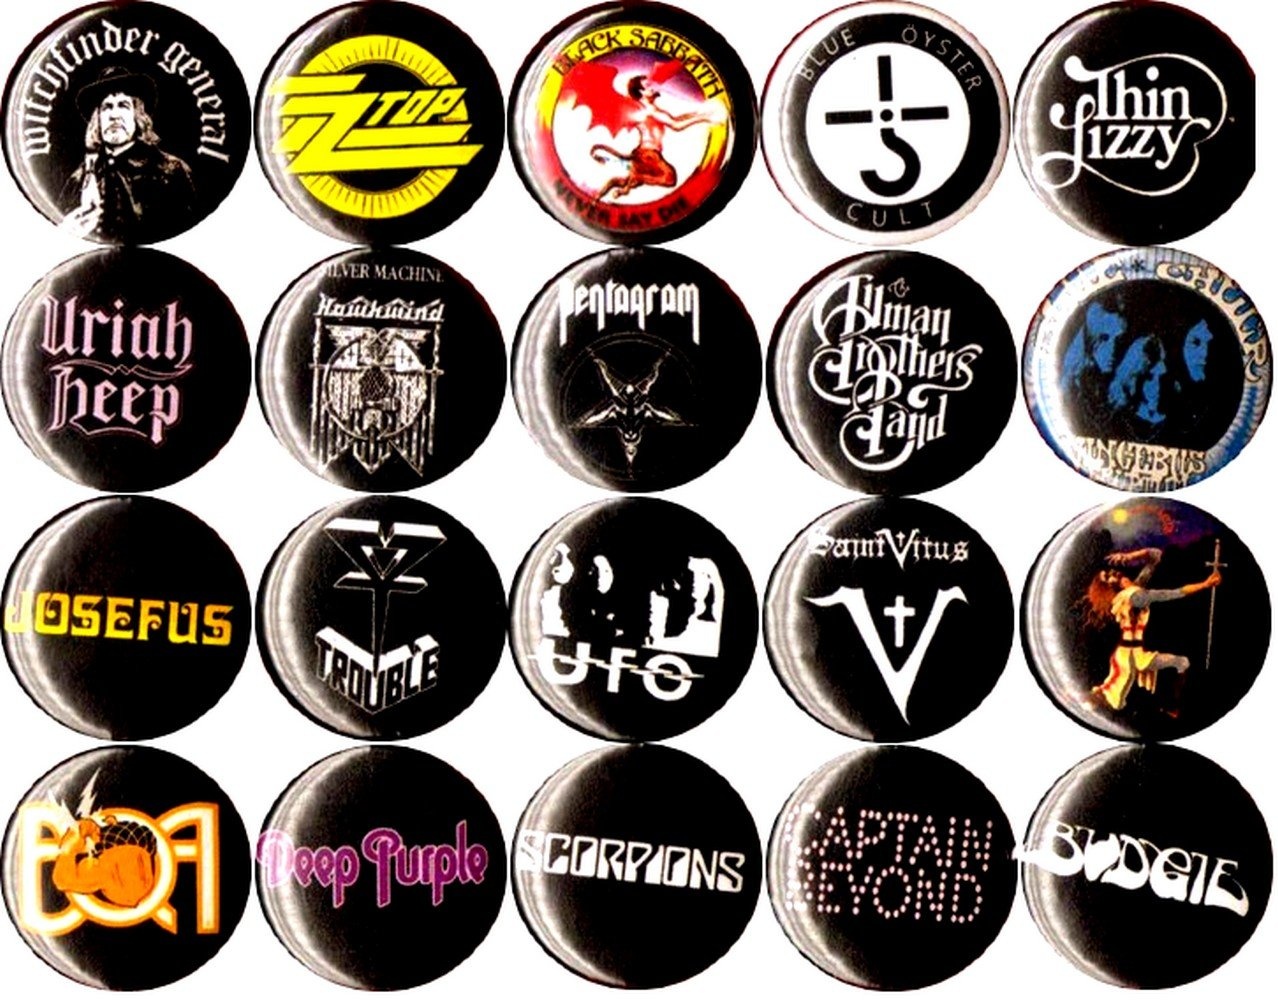 70s STONER ROCK NEW set of 20 1'' inch (25 mm) button pin badge hard nwobhm SLUDGE DOOM AOR heavy metal